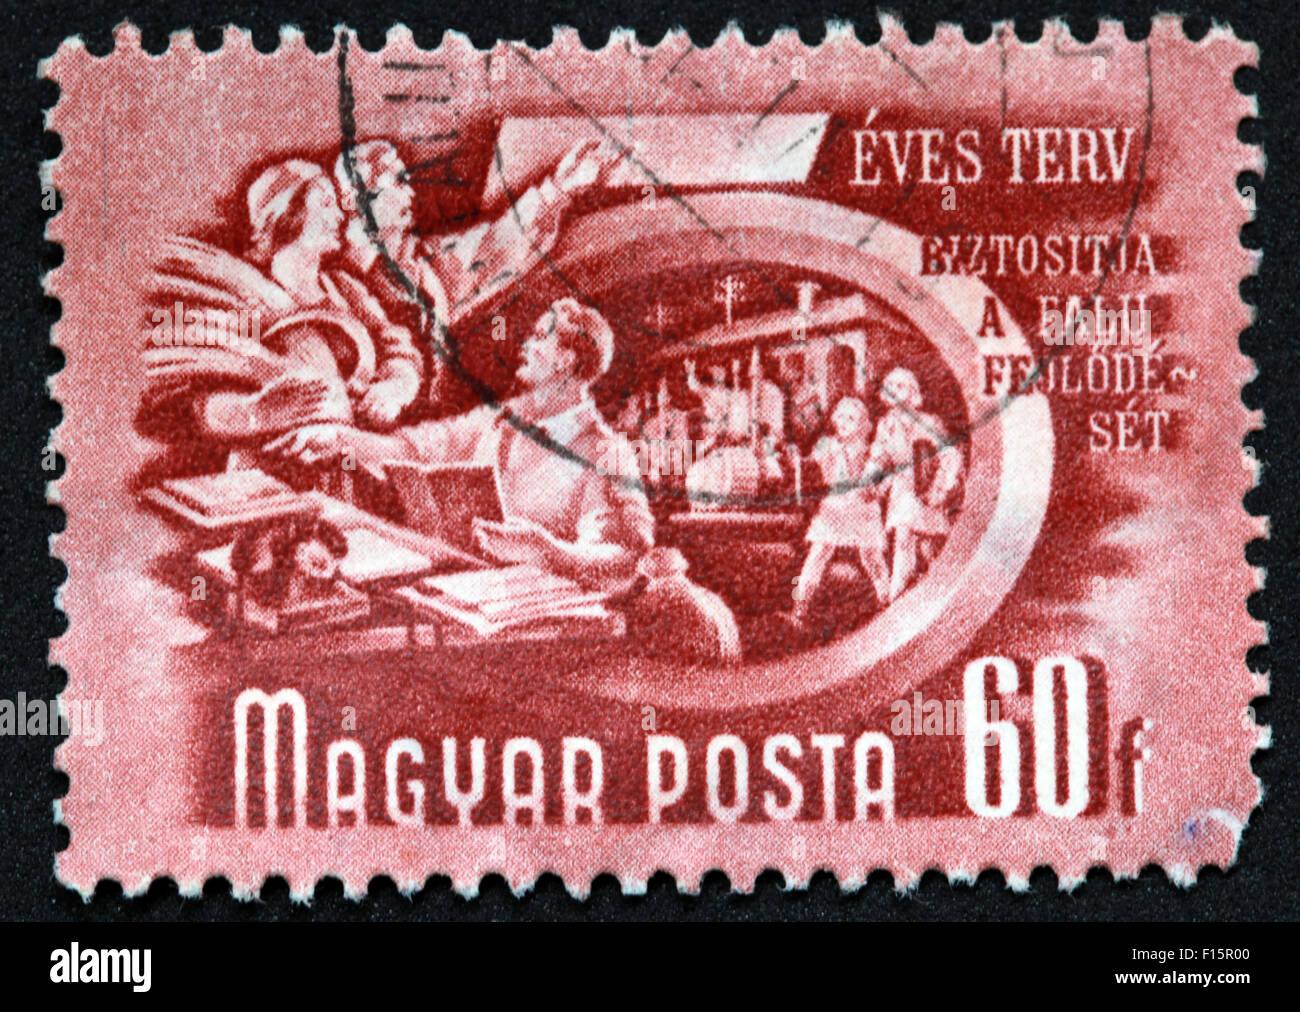 Magyar Posta 60f Eves Terv Biztositja a falu feulode set Stamp - Stock Image